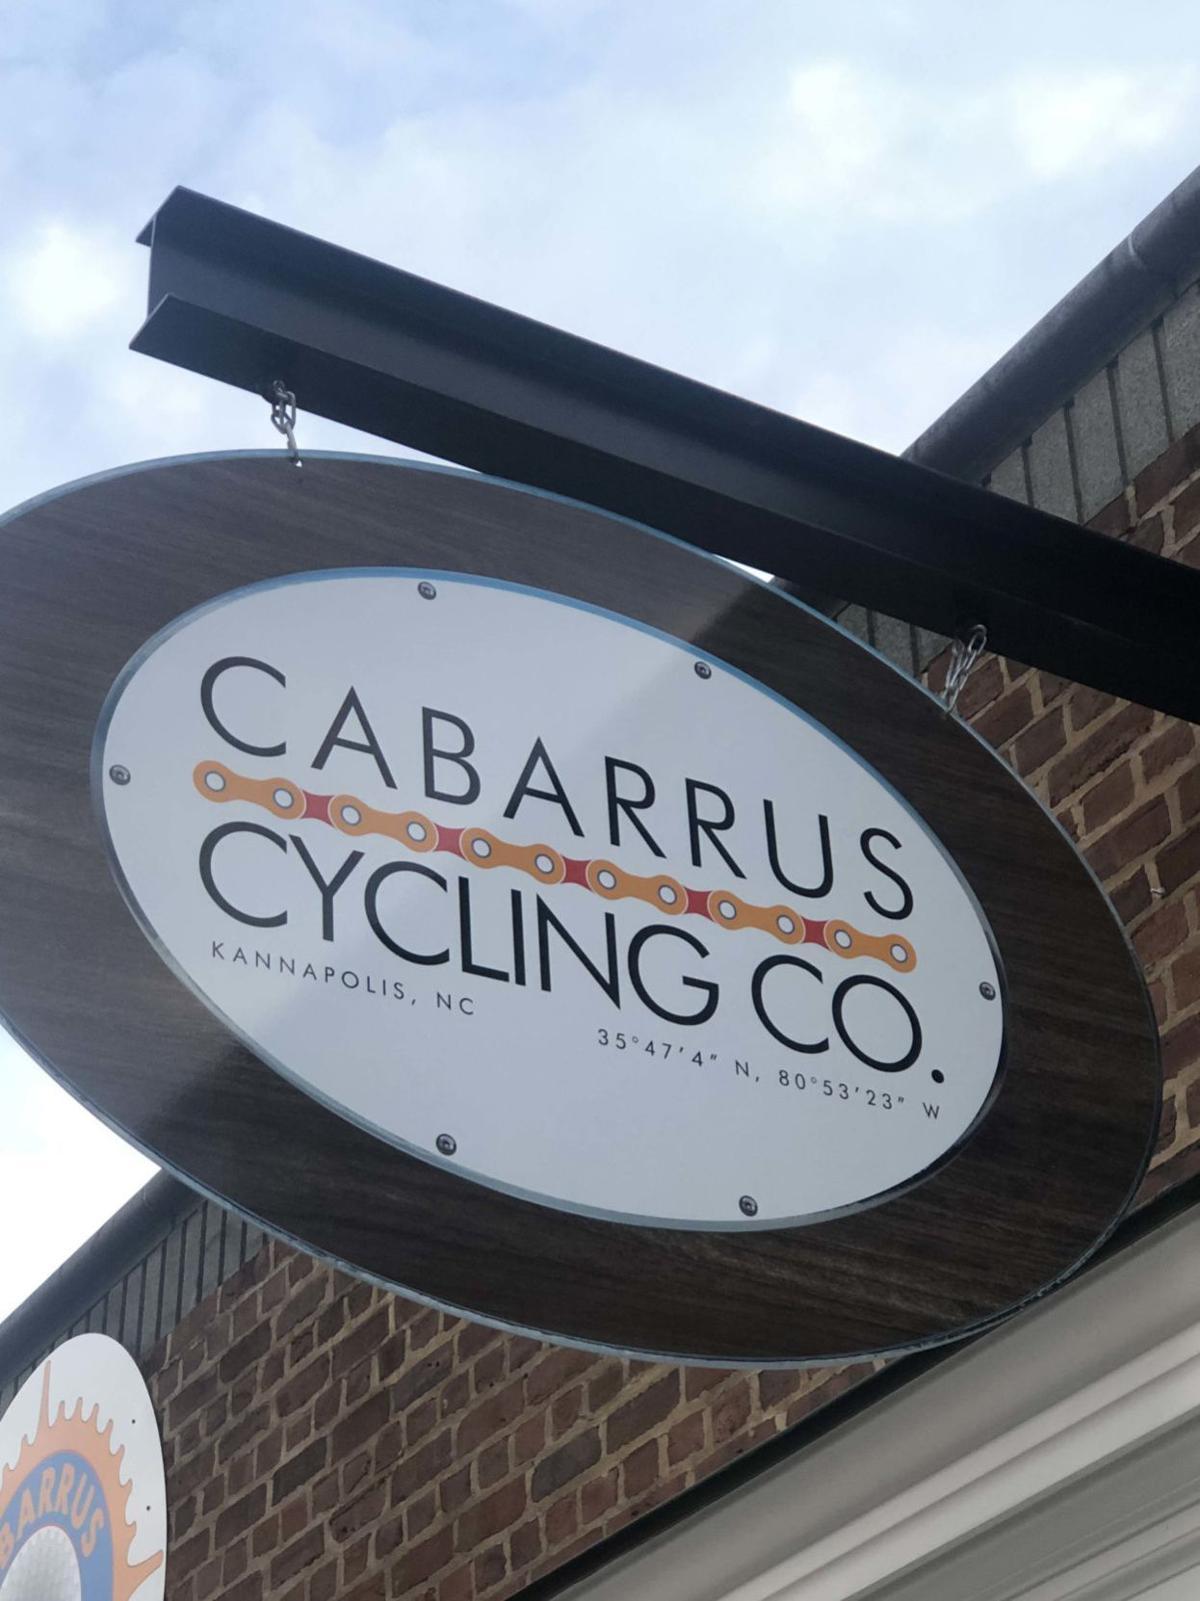 Cabarrus Cycling Company